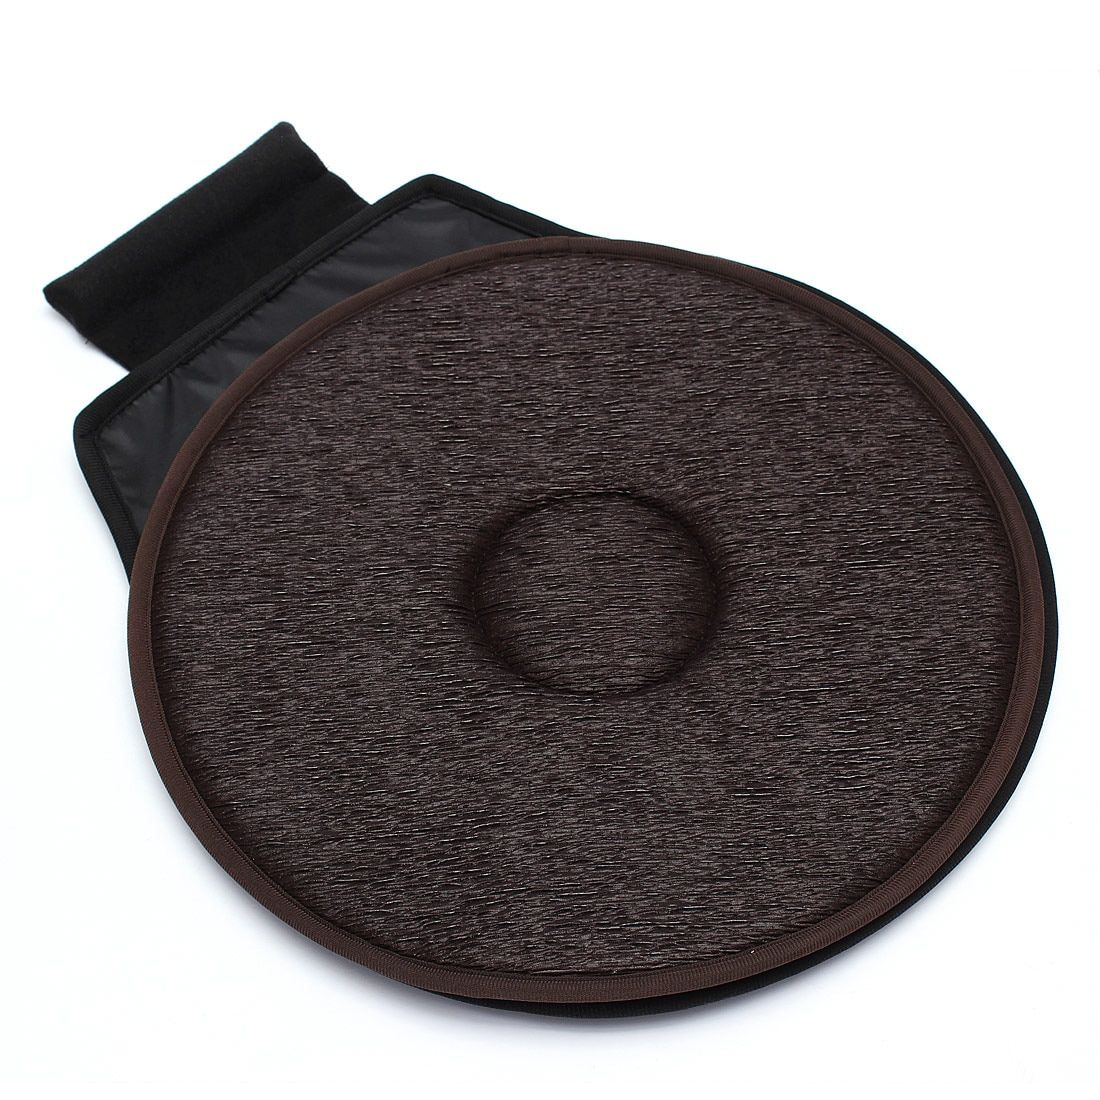 Non-slip Car Seat Revolving Rotating Cushion Swivel Foam Mobility Aid seat cushion in chair Tie On Pad Dark brown-VIP link